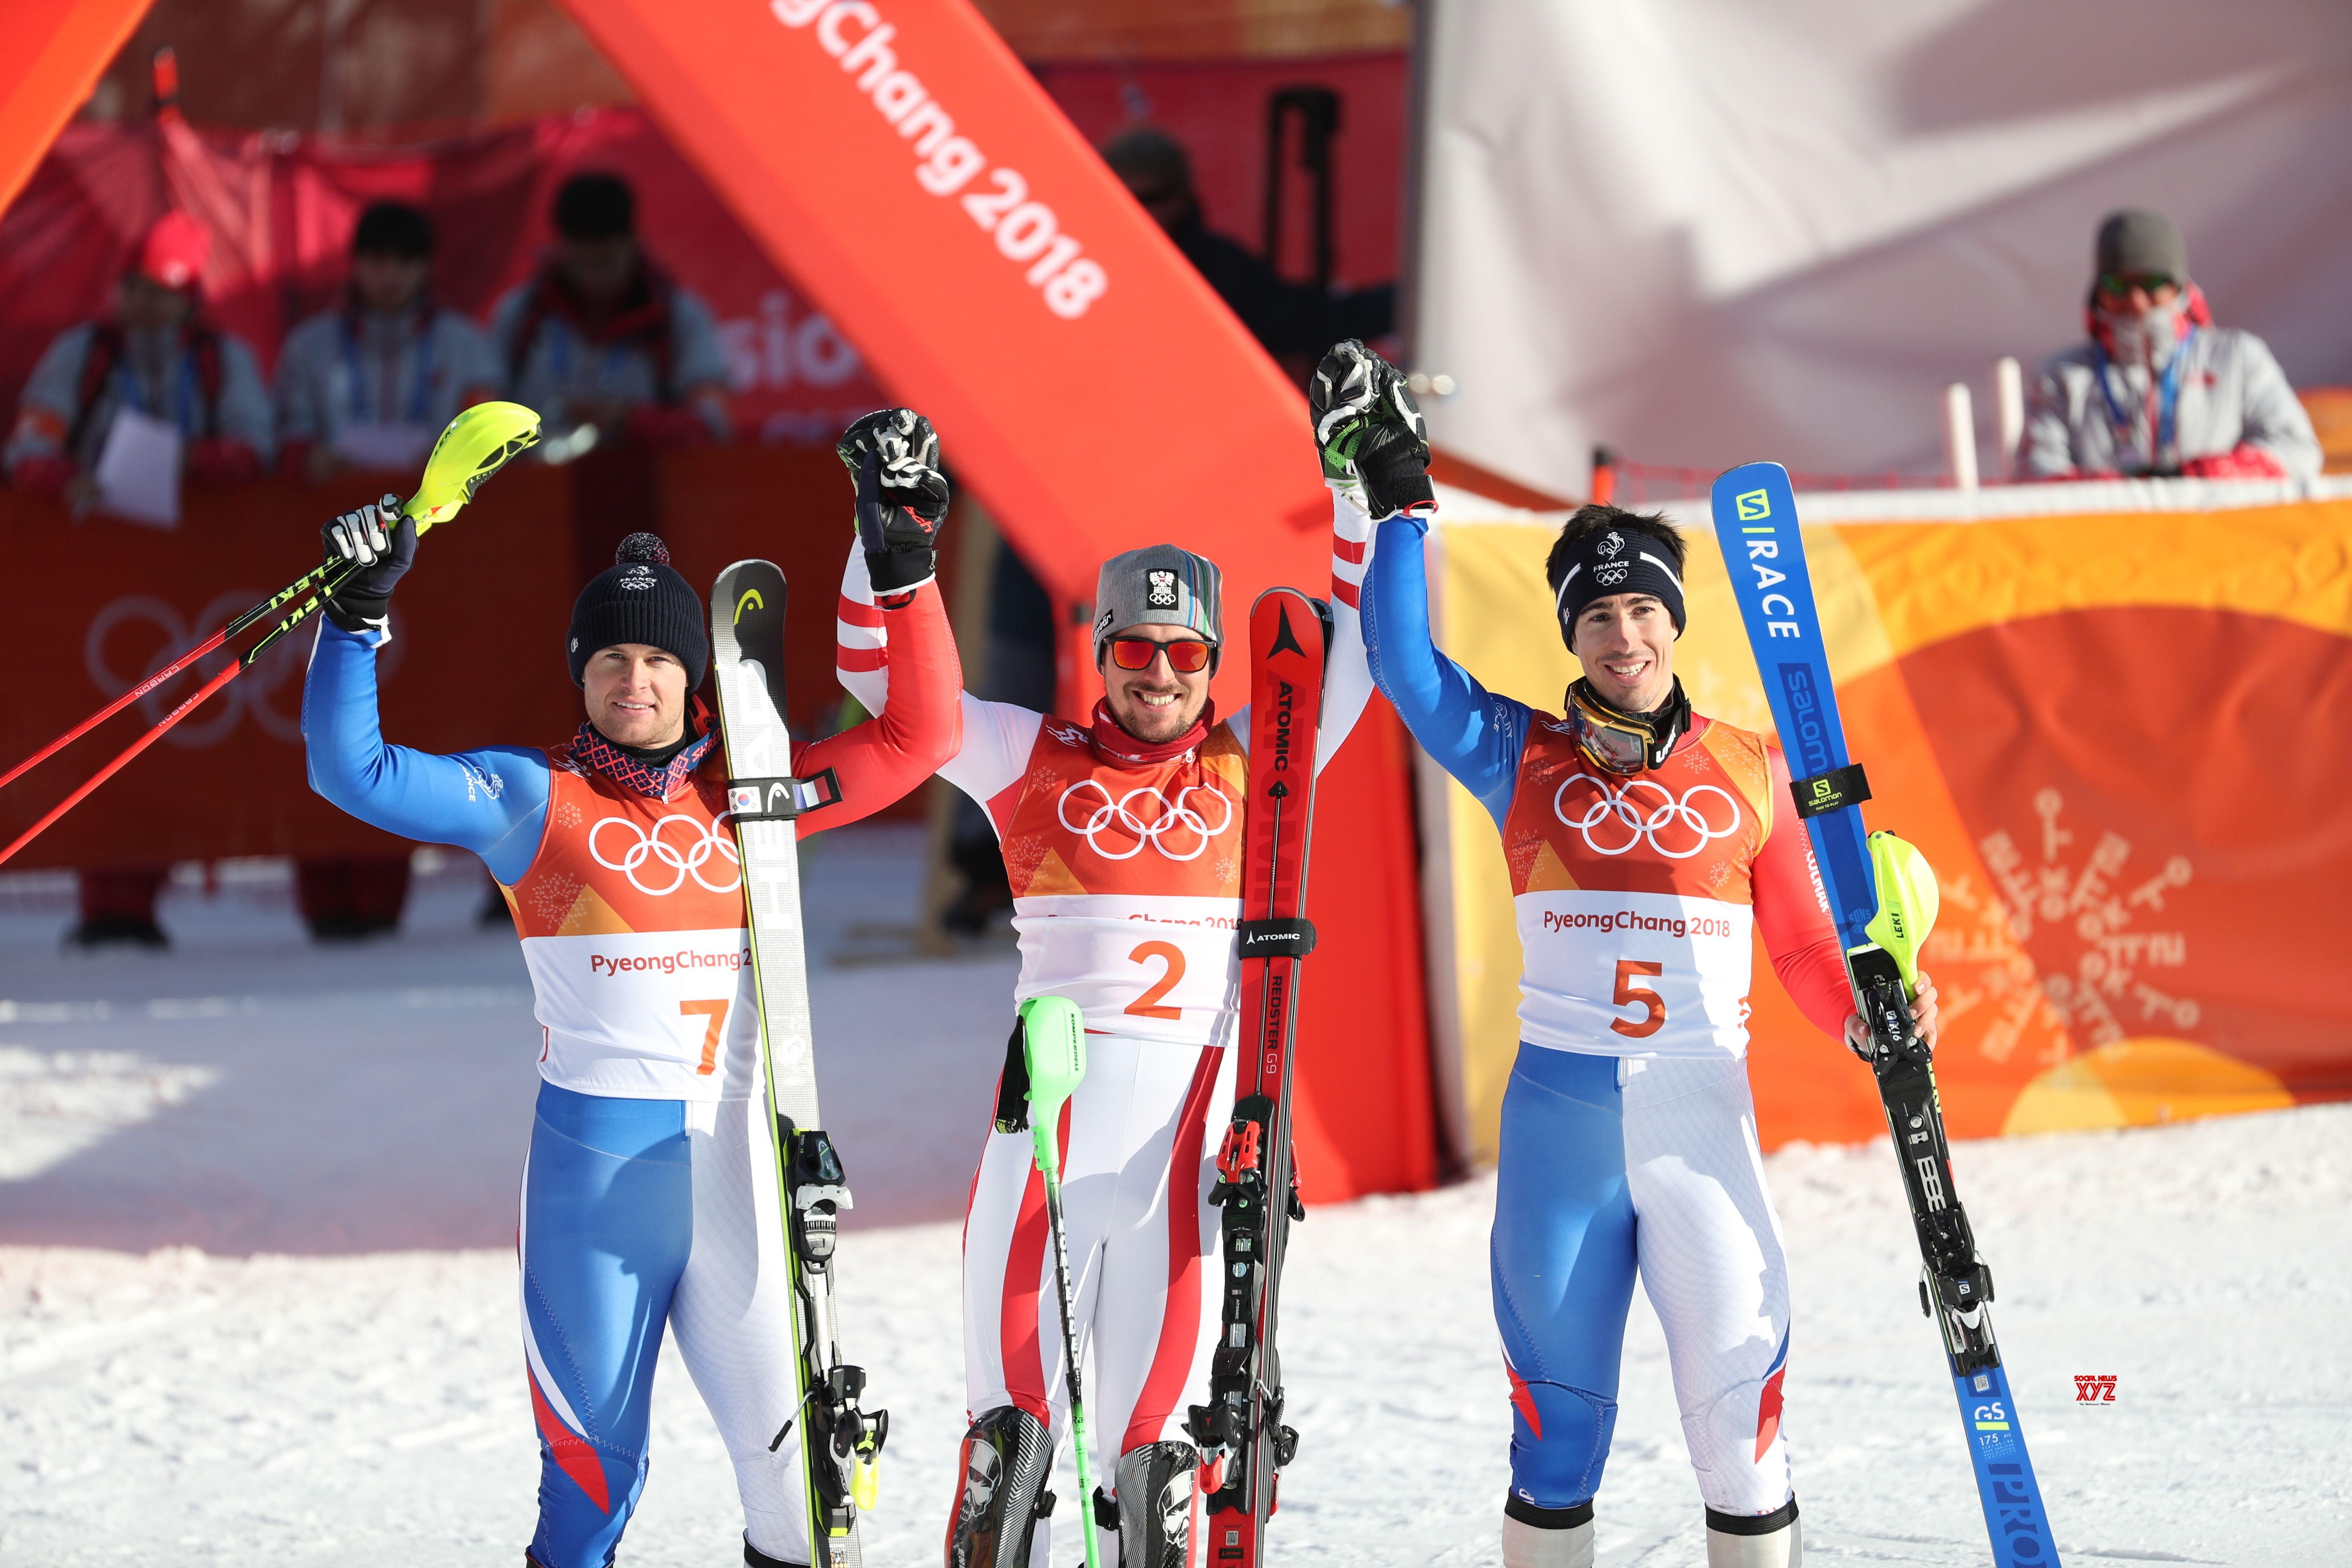 Austria's Hirscher takes gold in Men's Alpine combined